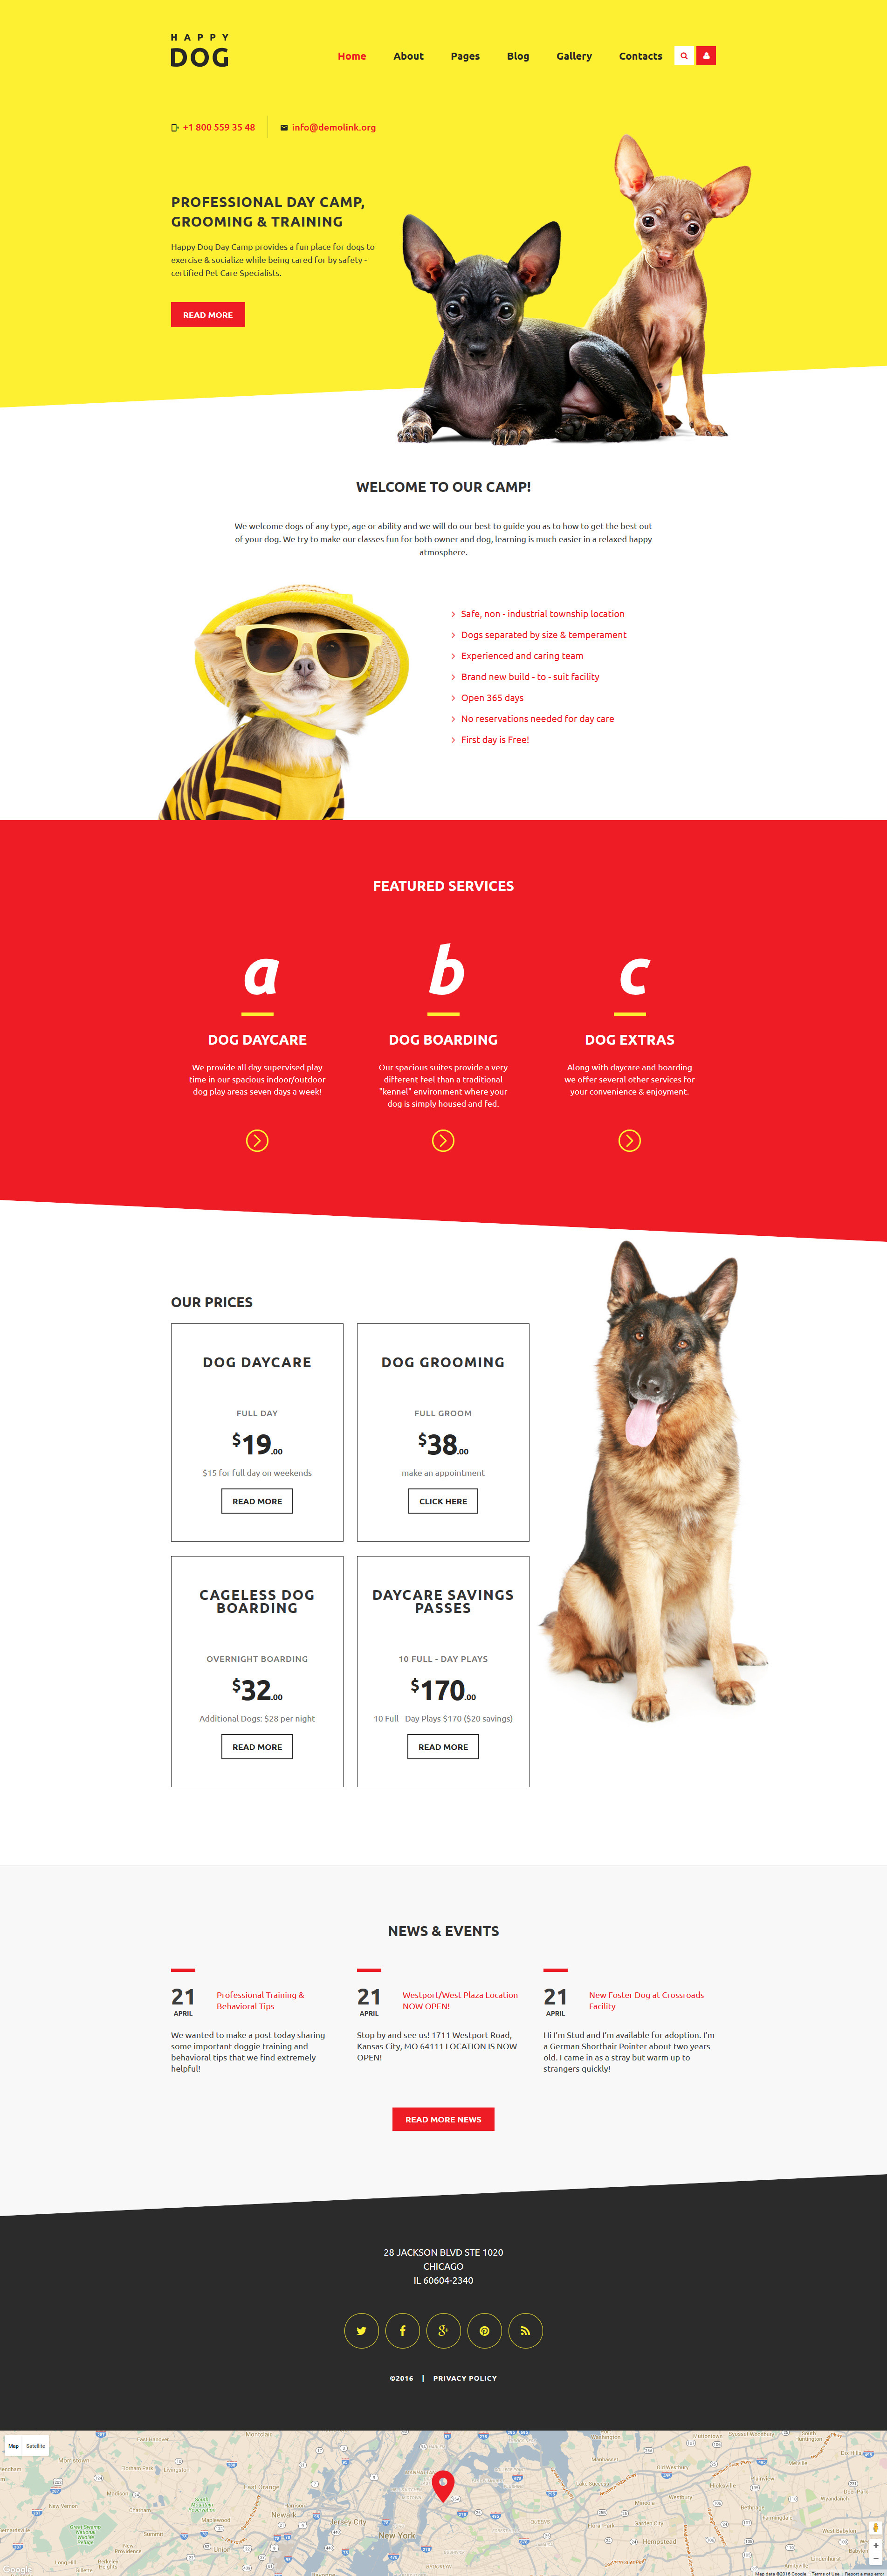 Free Dog Grooming WordPress Themes